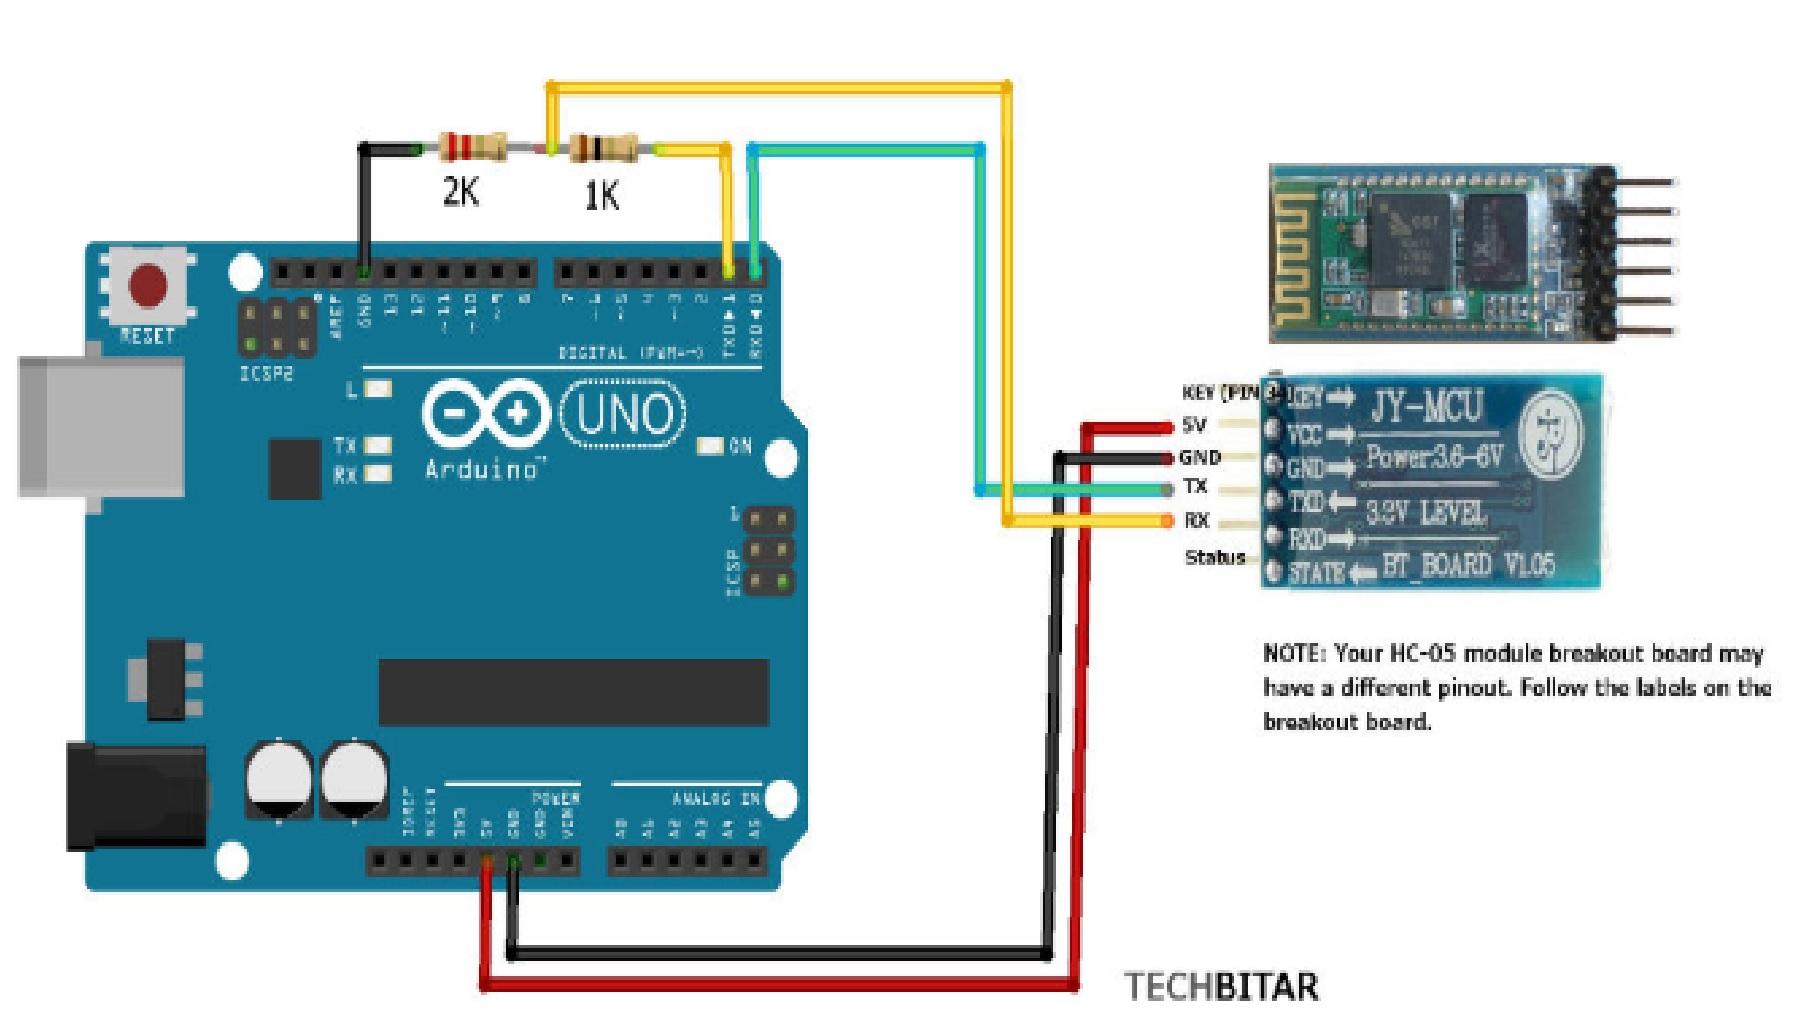 Autopilot Drone Cc3d Wiring Diagrams With Orange Rx Untitled Ffh3jam7nl